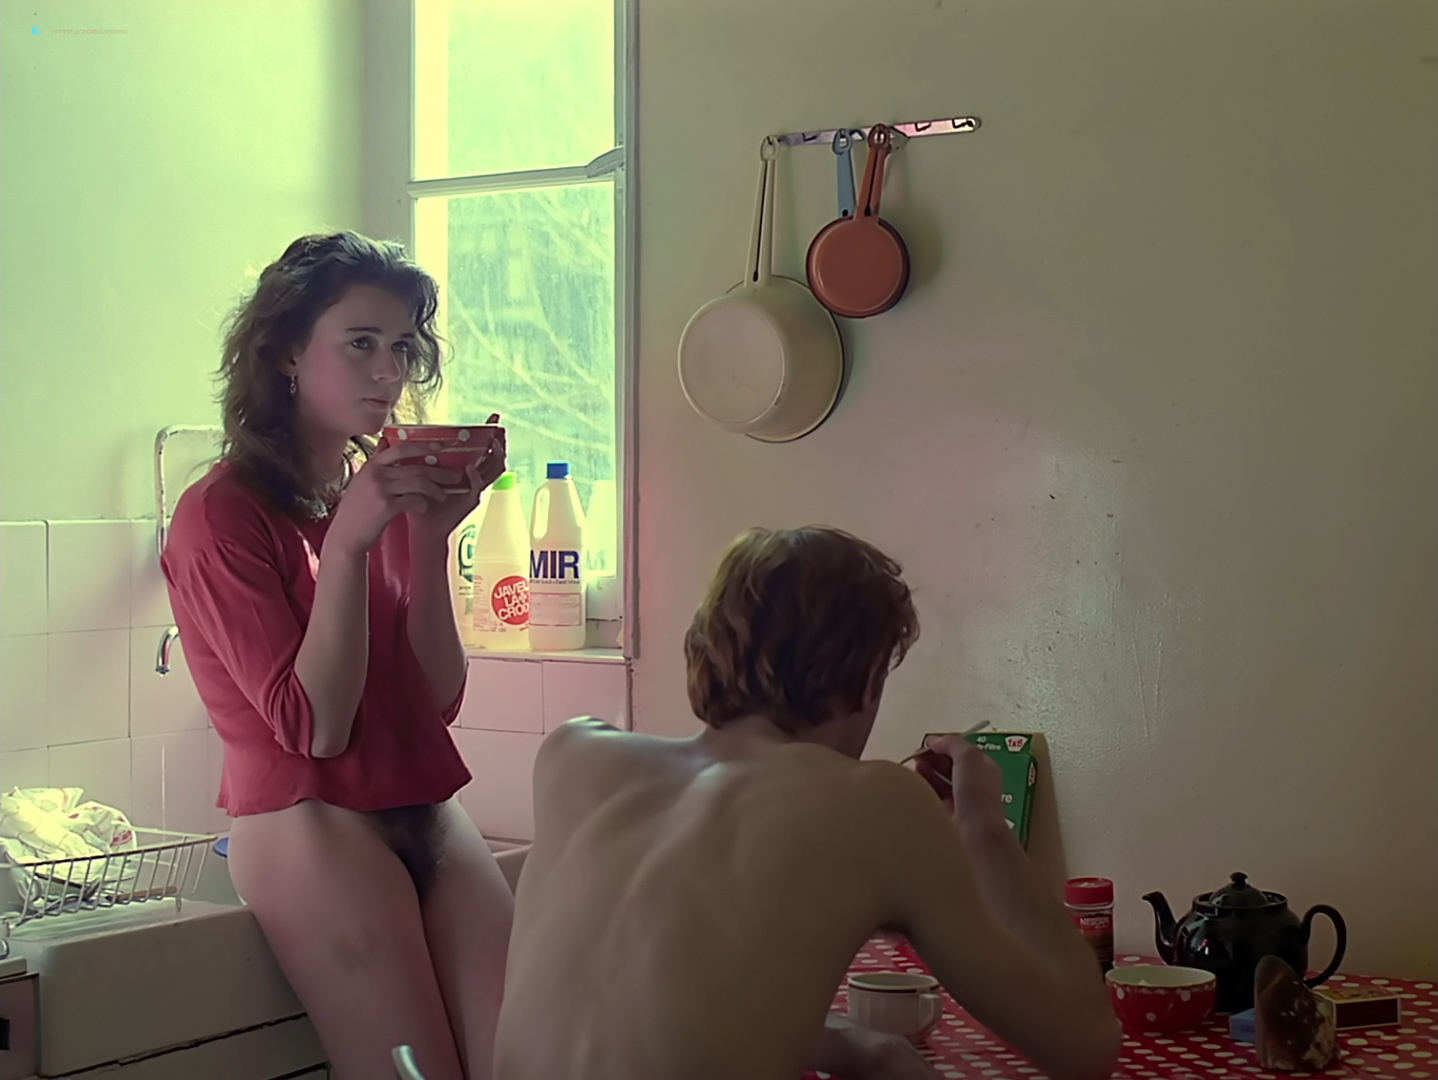 Maruschka Detmers nude full frontal - Prénom Carmen (1983) HD 1080p BluRay (11)